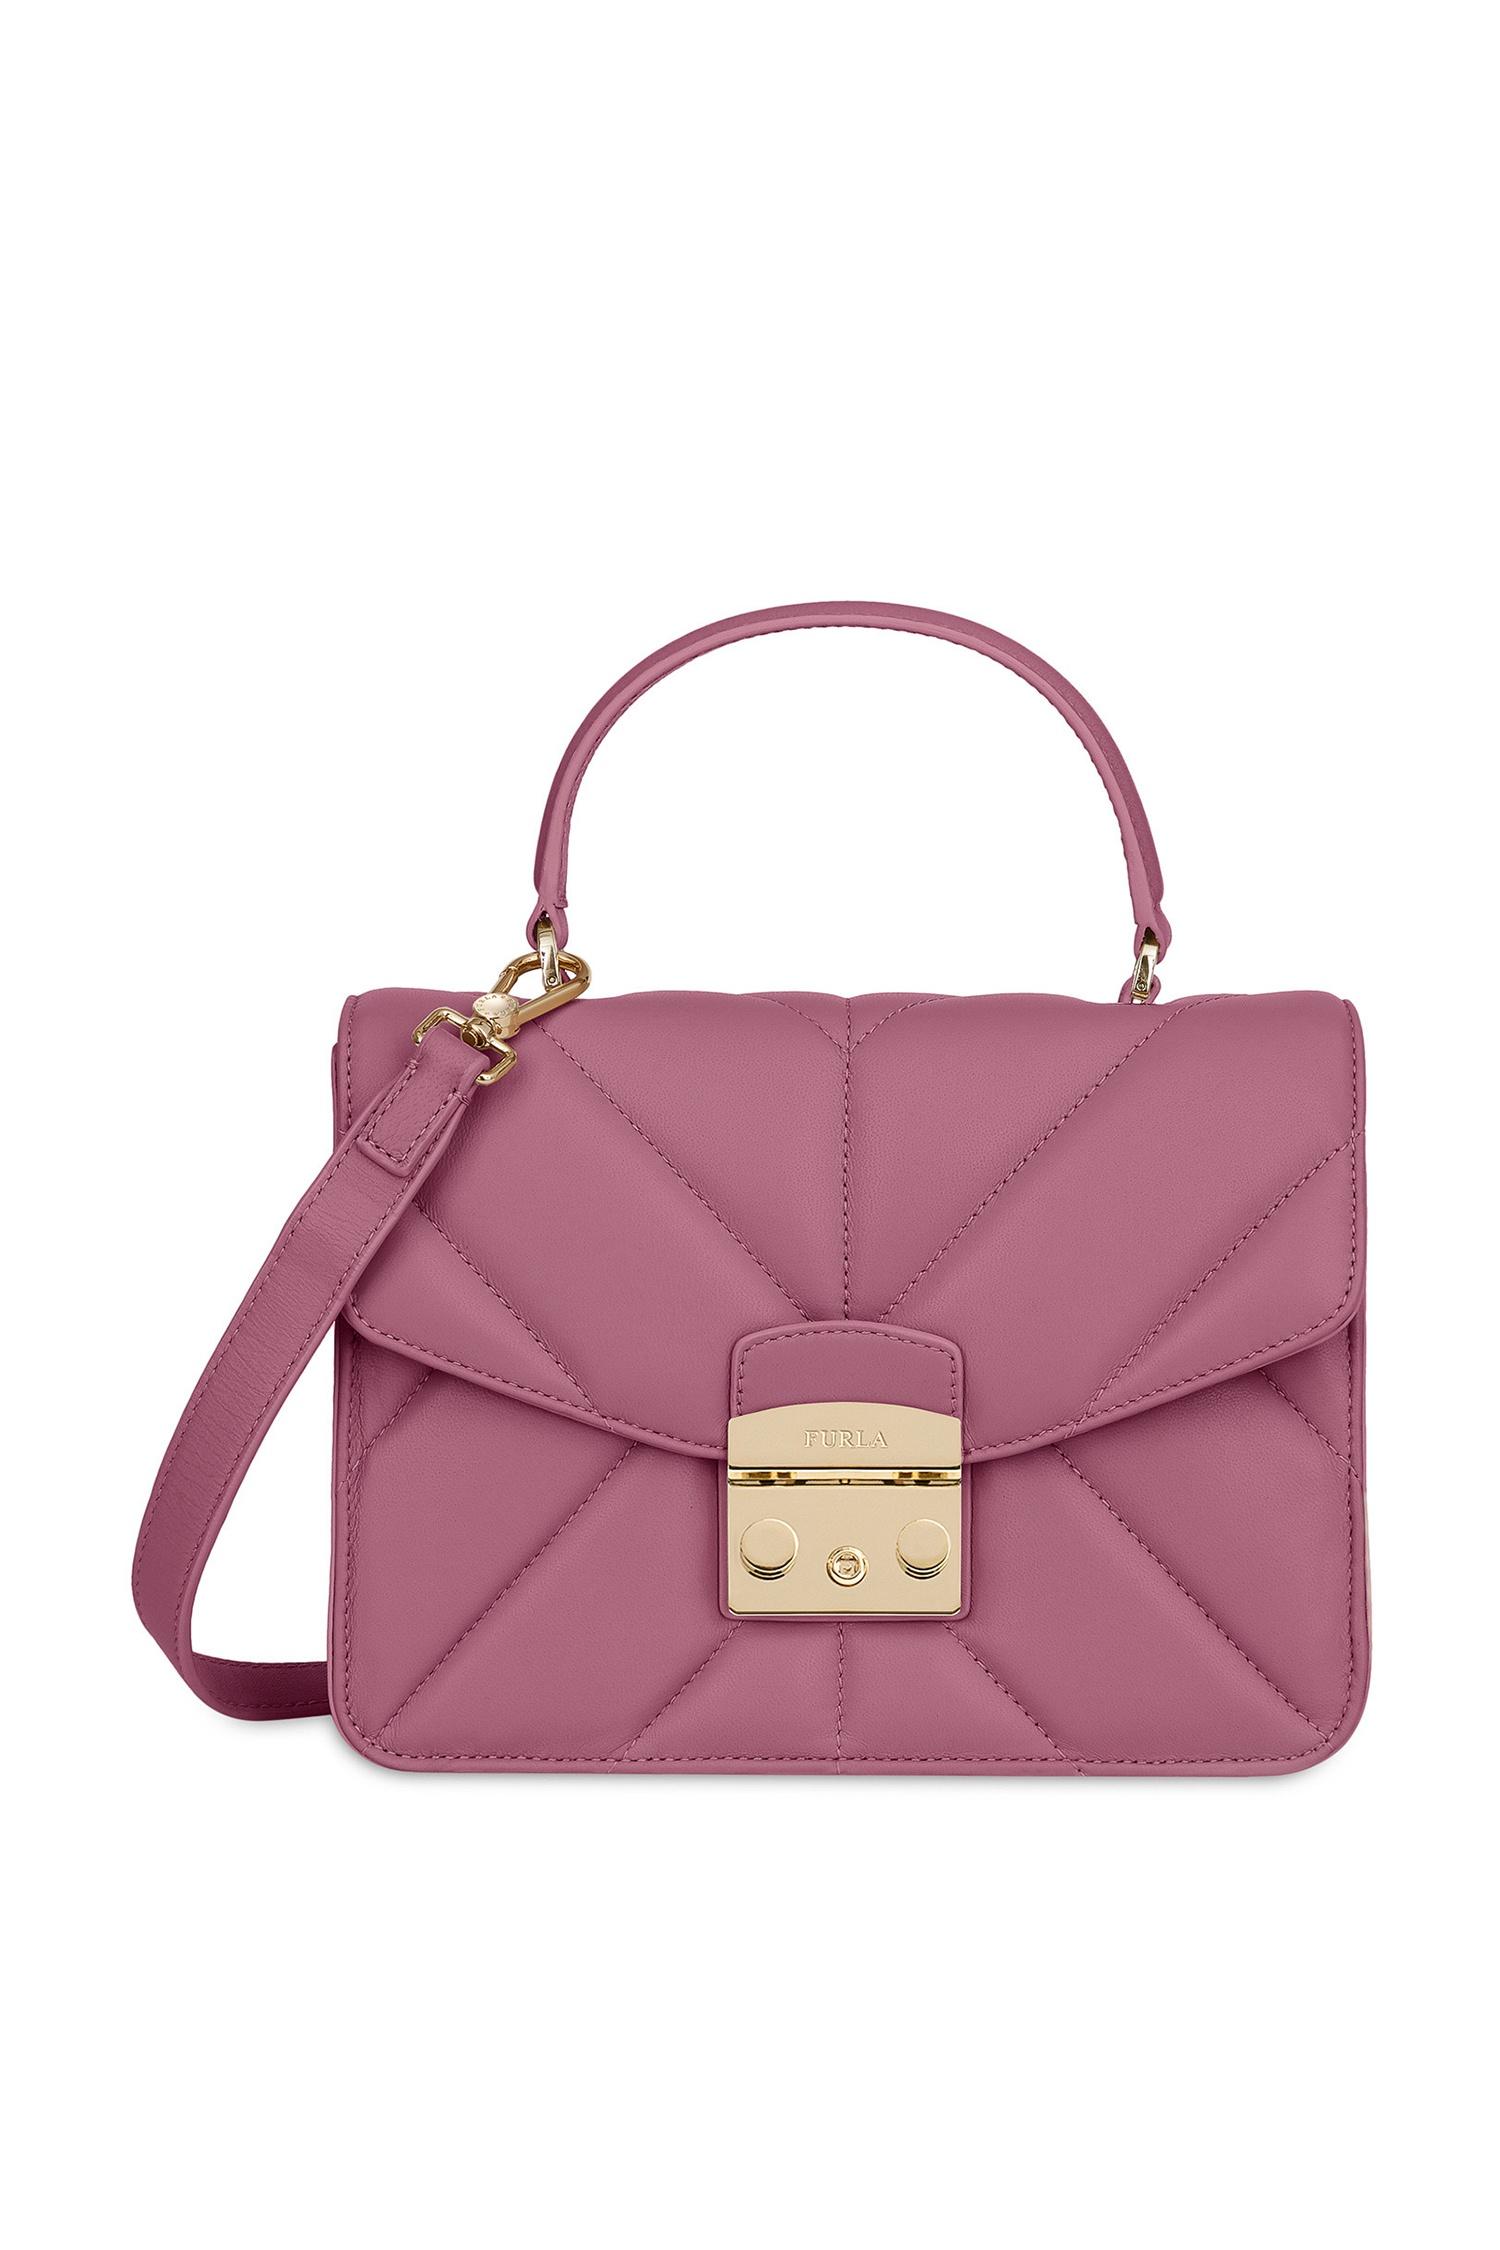 378d5d629e11 Розовая сумка Metropolis FURLA - Компактная сумка розового цвета ...